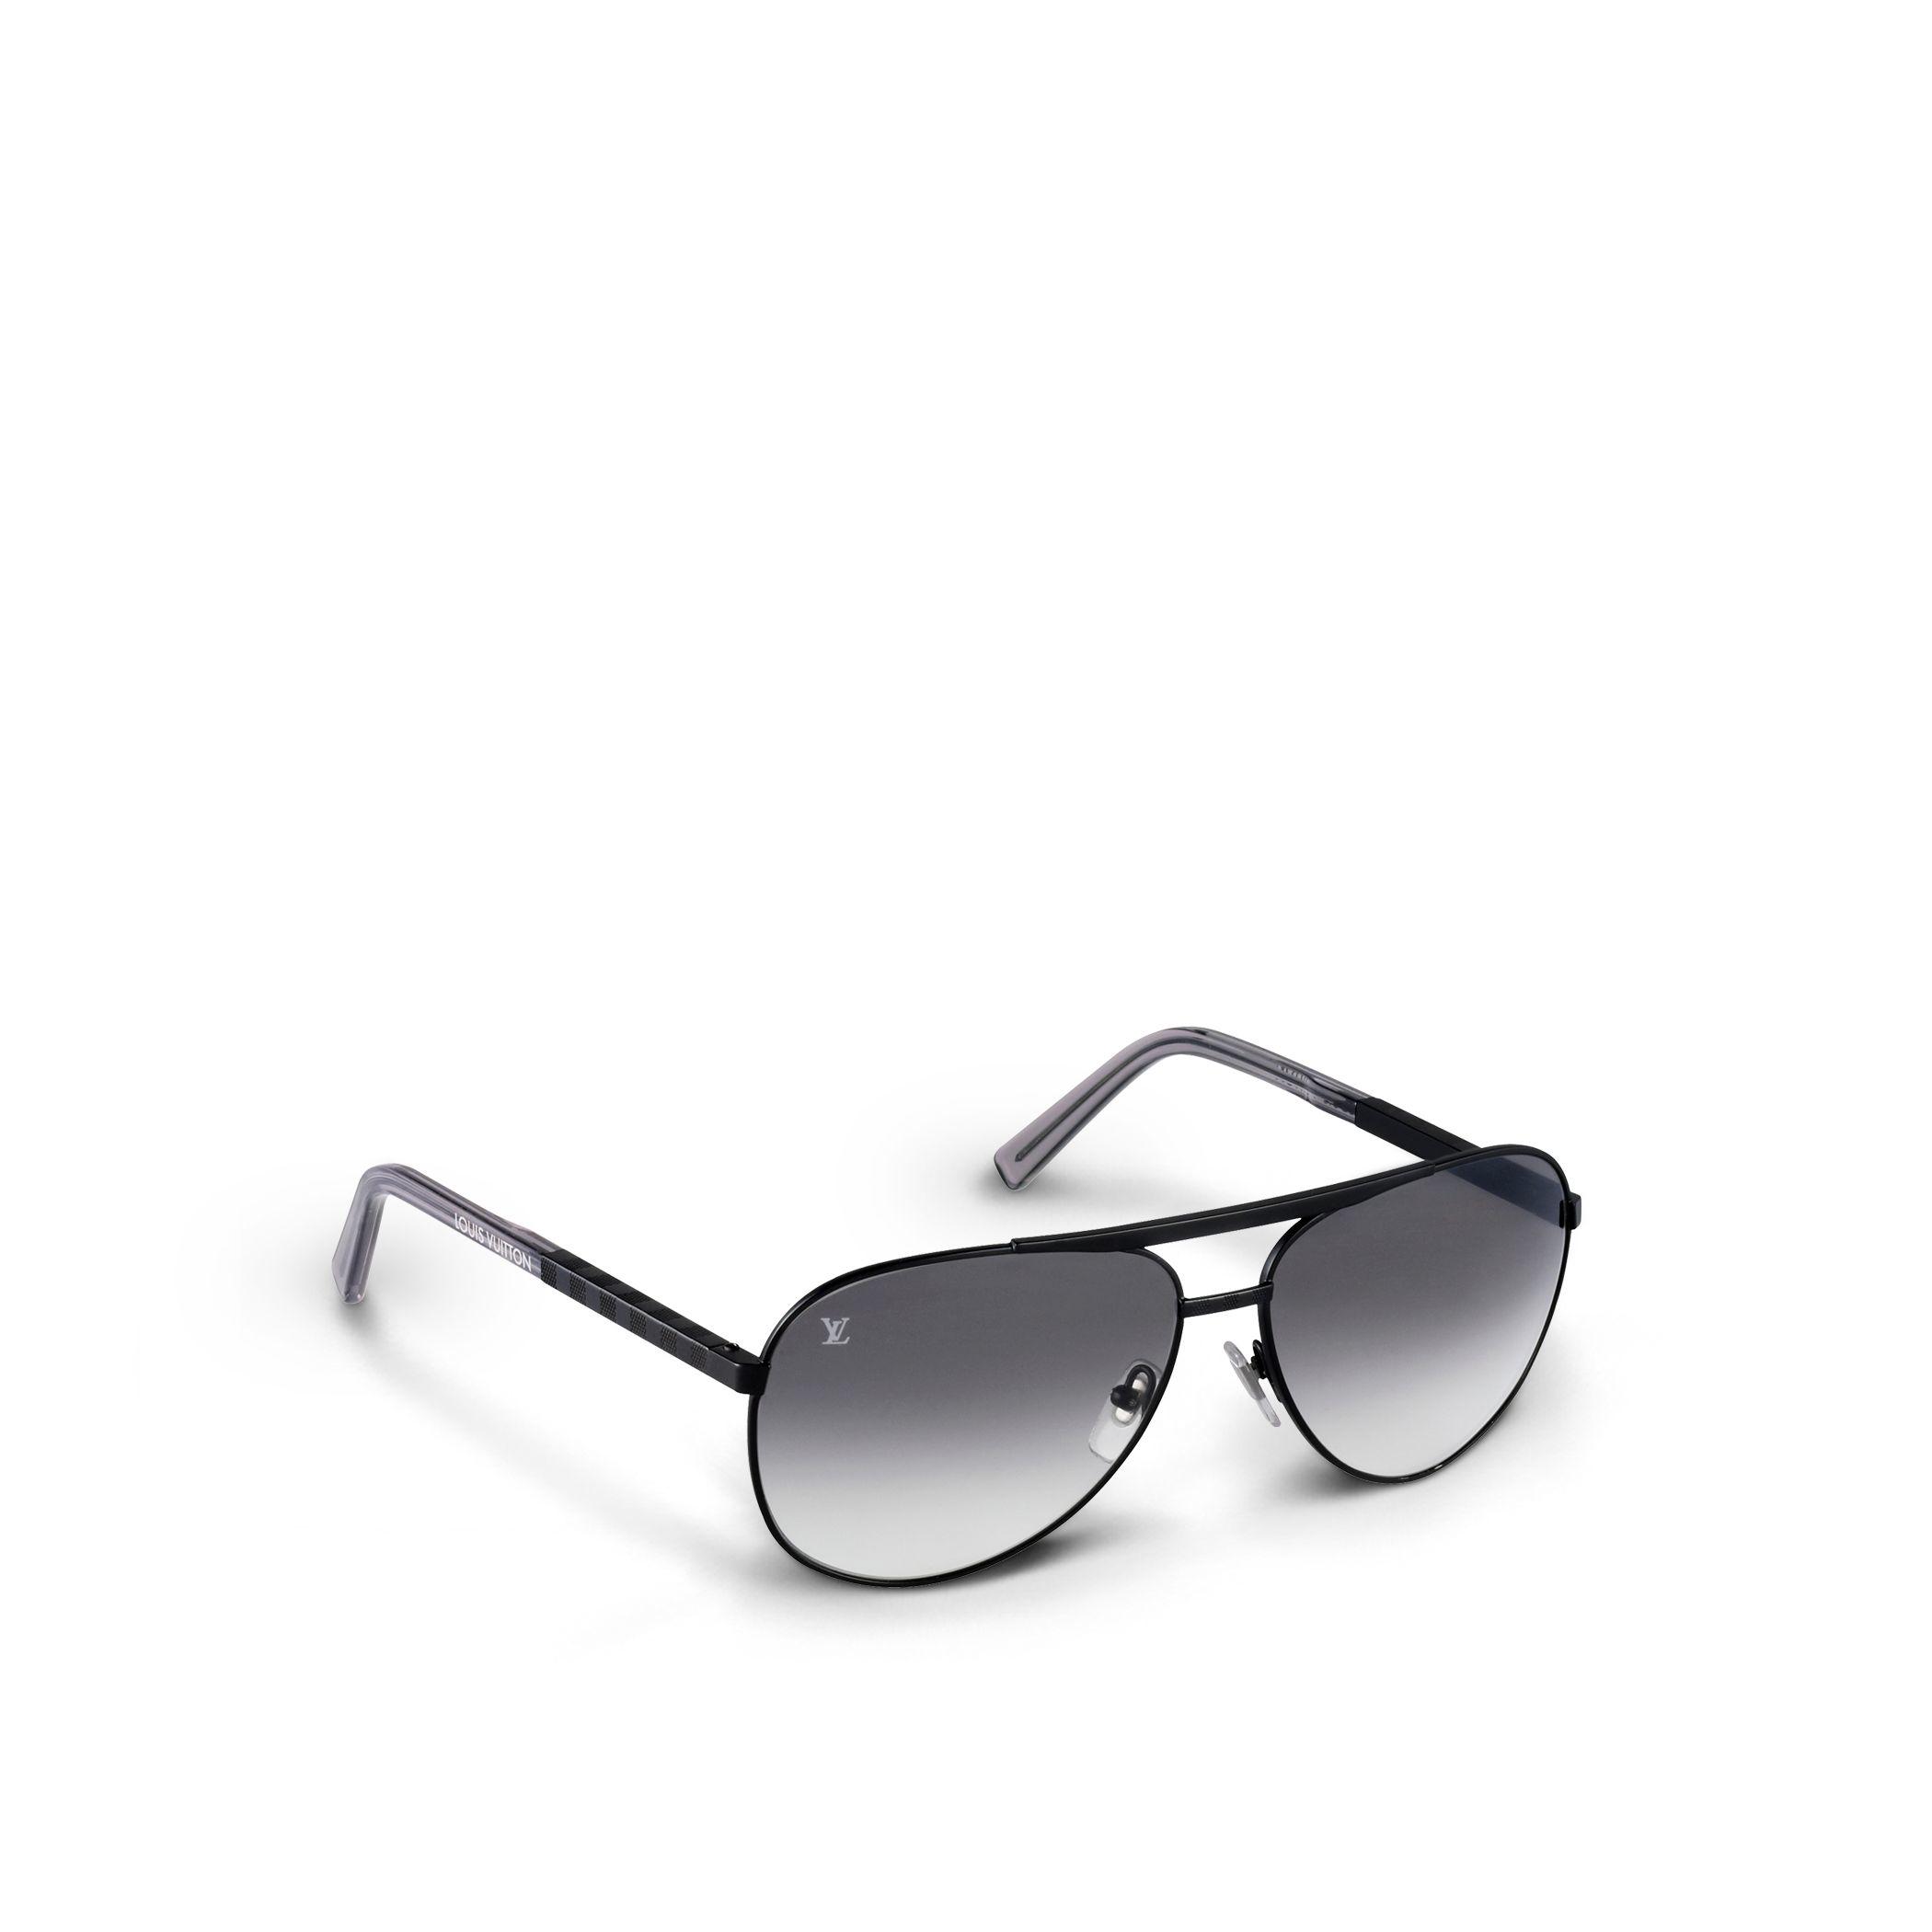 Louis Vuitton Attitude Pilote In Black For Men Lyst